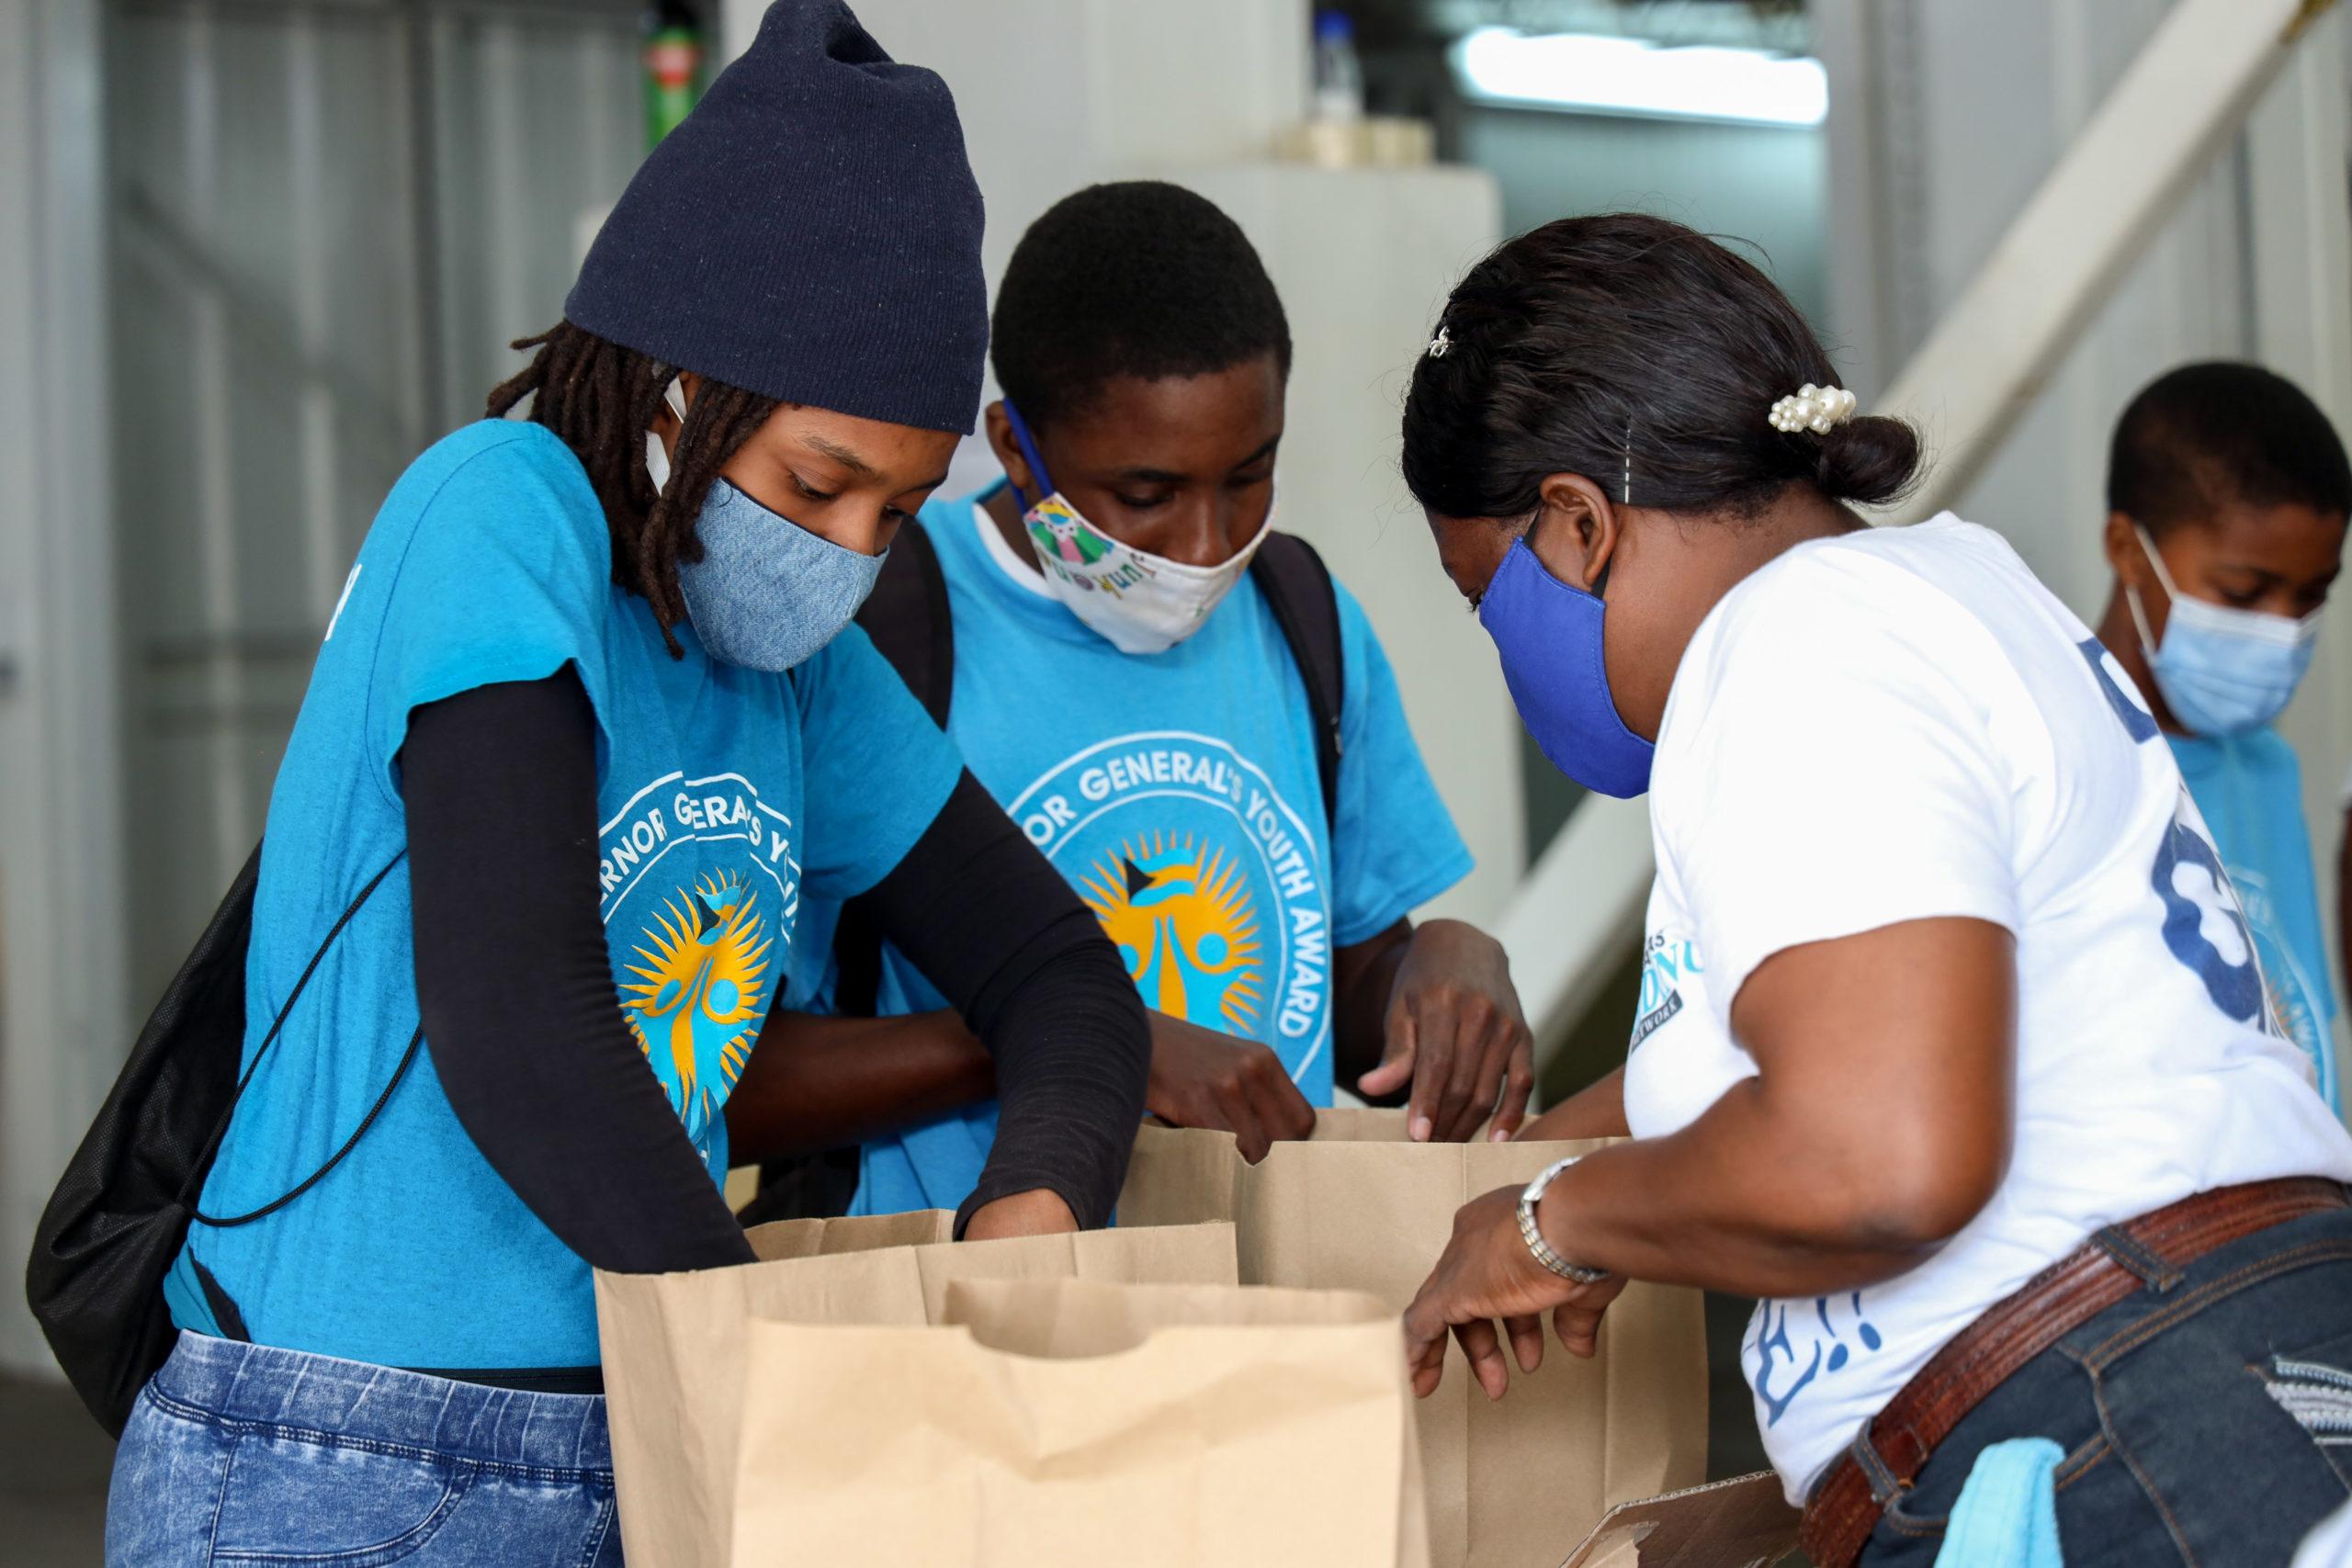 Governor general presents first Frank Crothers Awards for Volunteerism at BFN